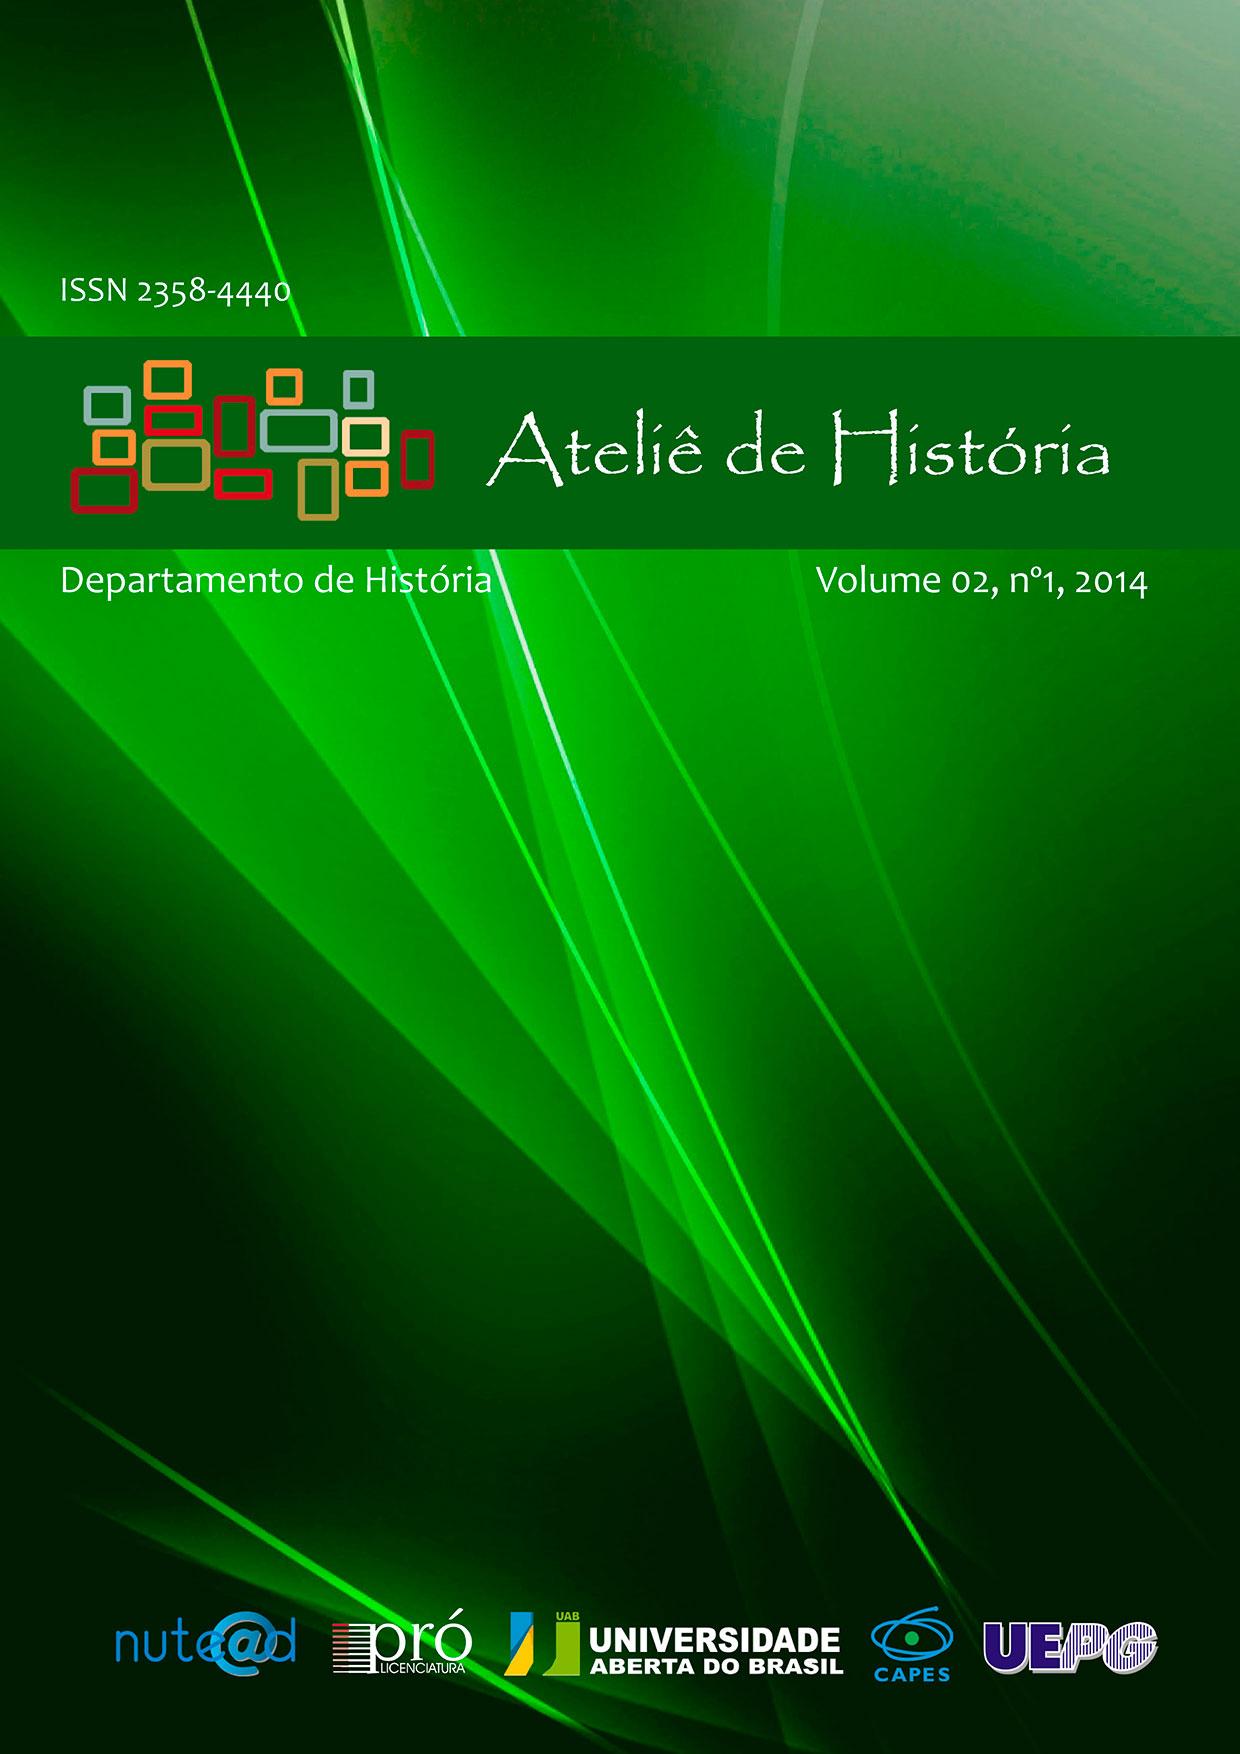 Ateliê de História UEPG v.2, n.1 (2014)